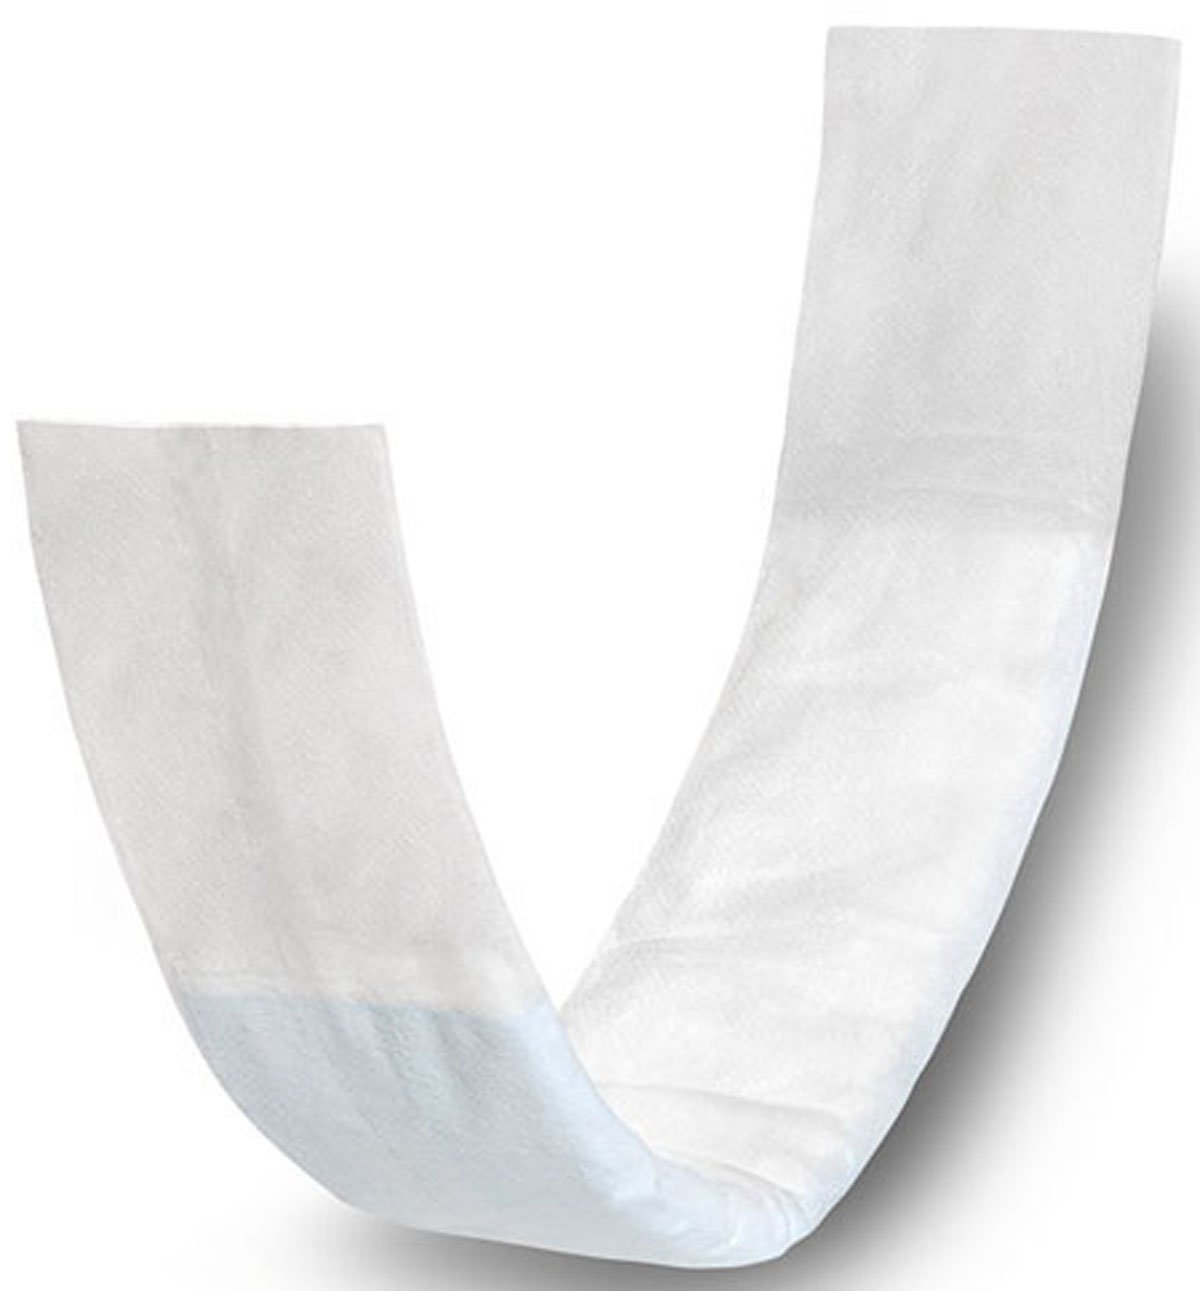 Medline NON241280 Maternity Feminine Hygiene Pads with Tails, 11'' (Pack of 288) by Medline